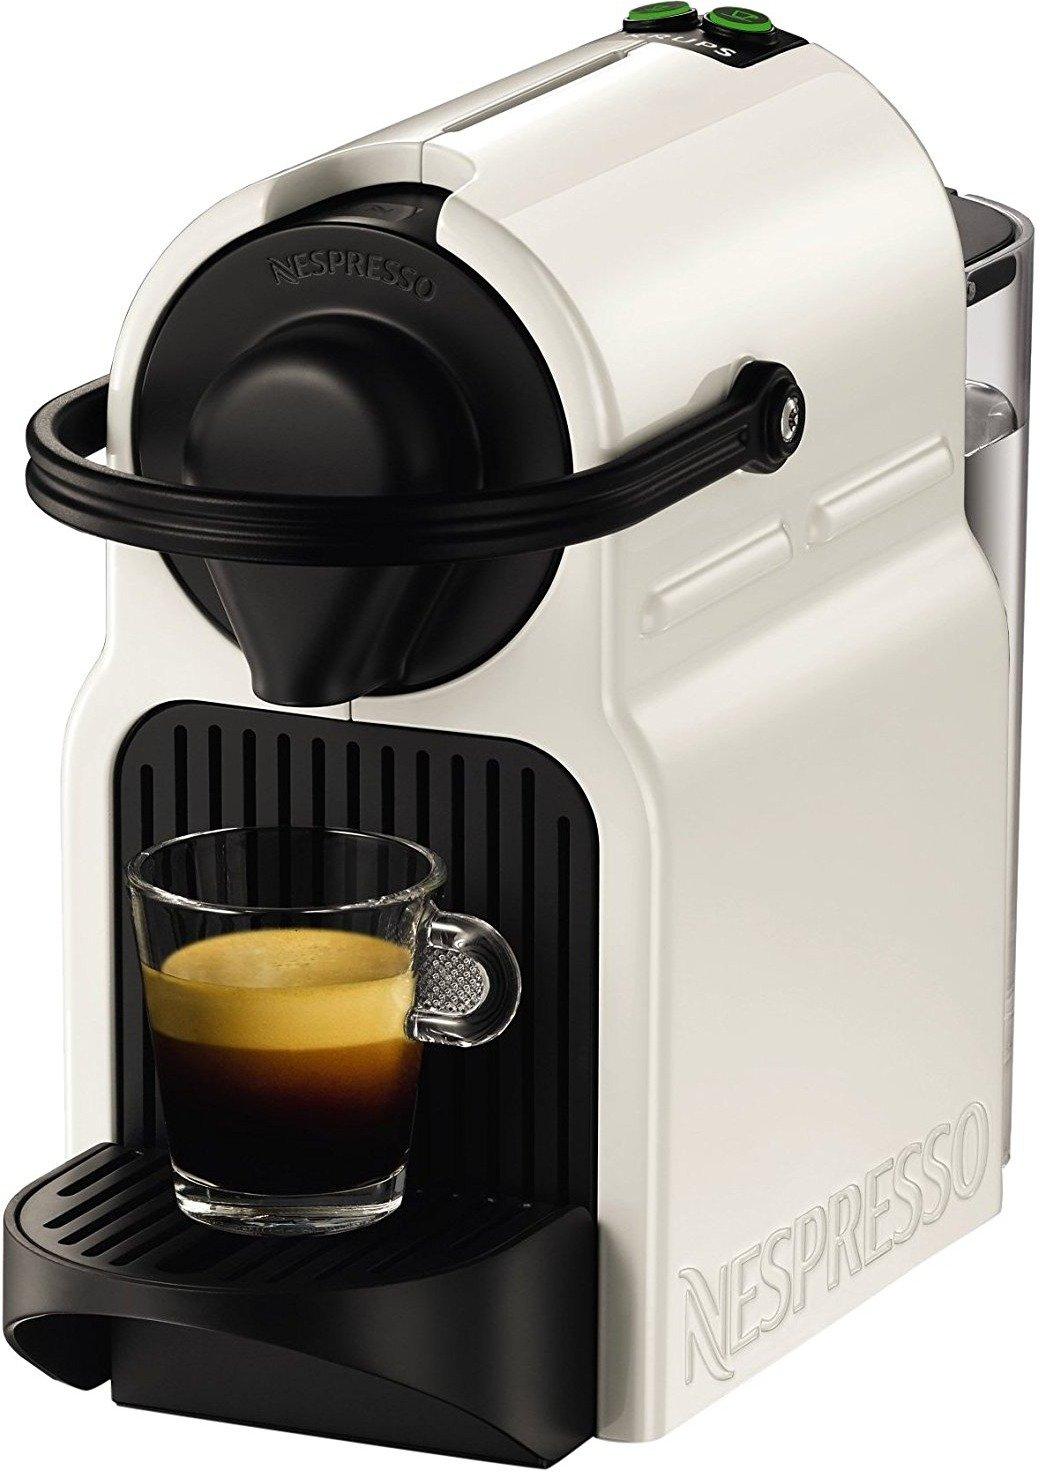 Machine à capsules Krups Nespresso Inissia à 10€ dès 400 capsules de café Nespresso achetées + coffret de 14 capsules Grand Crus offert ou 2 machines pour 10€ dès 800 capsules achetées + 2 coffrets de 14 capsules Grand Crus offerts